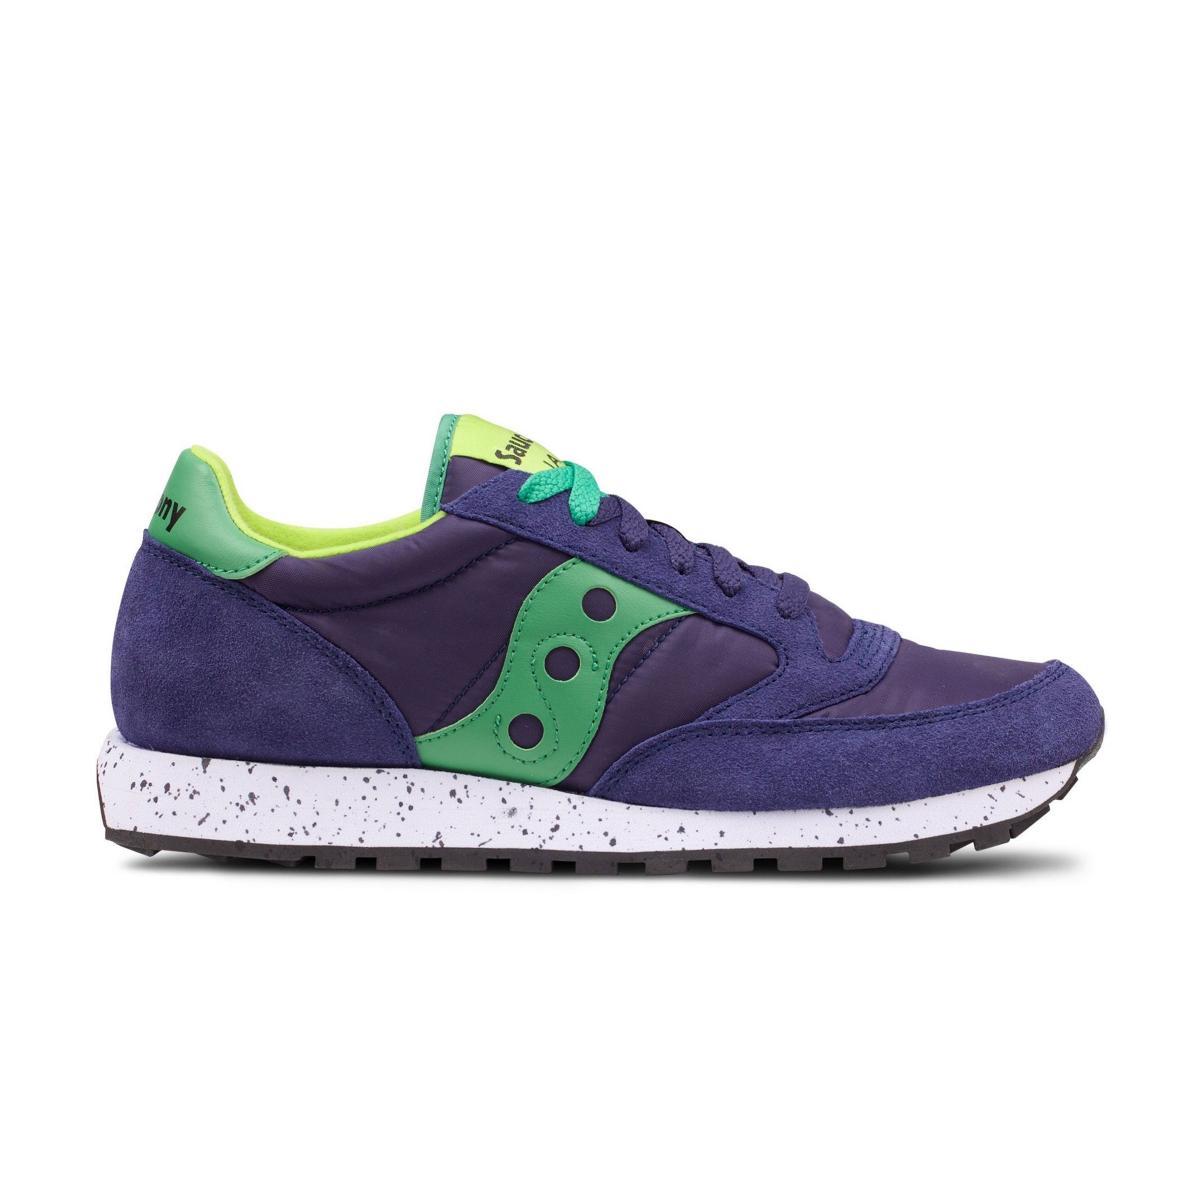 Scarpe Sneakers Saucony Jazz Original uomo rif. S2044-457